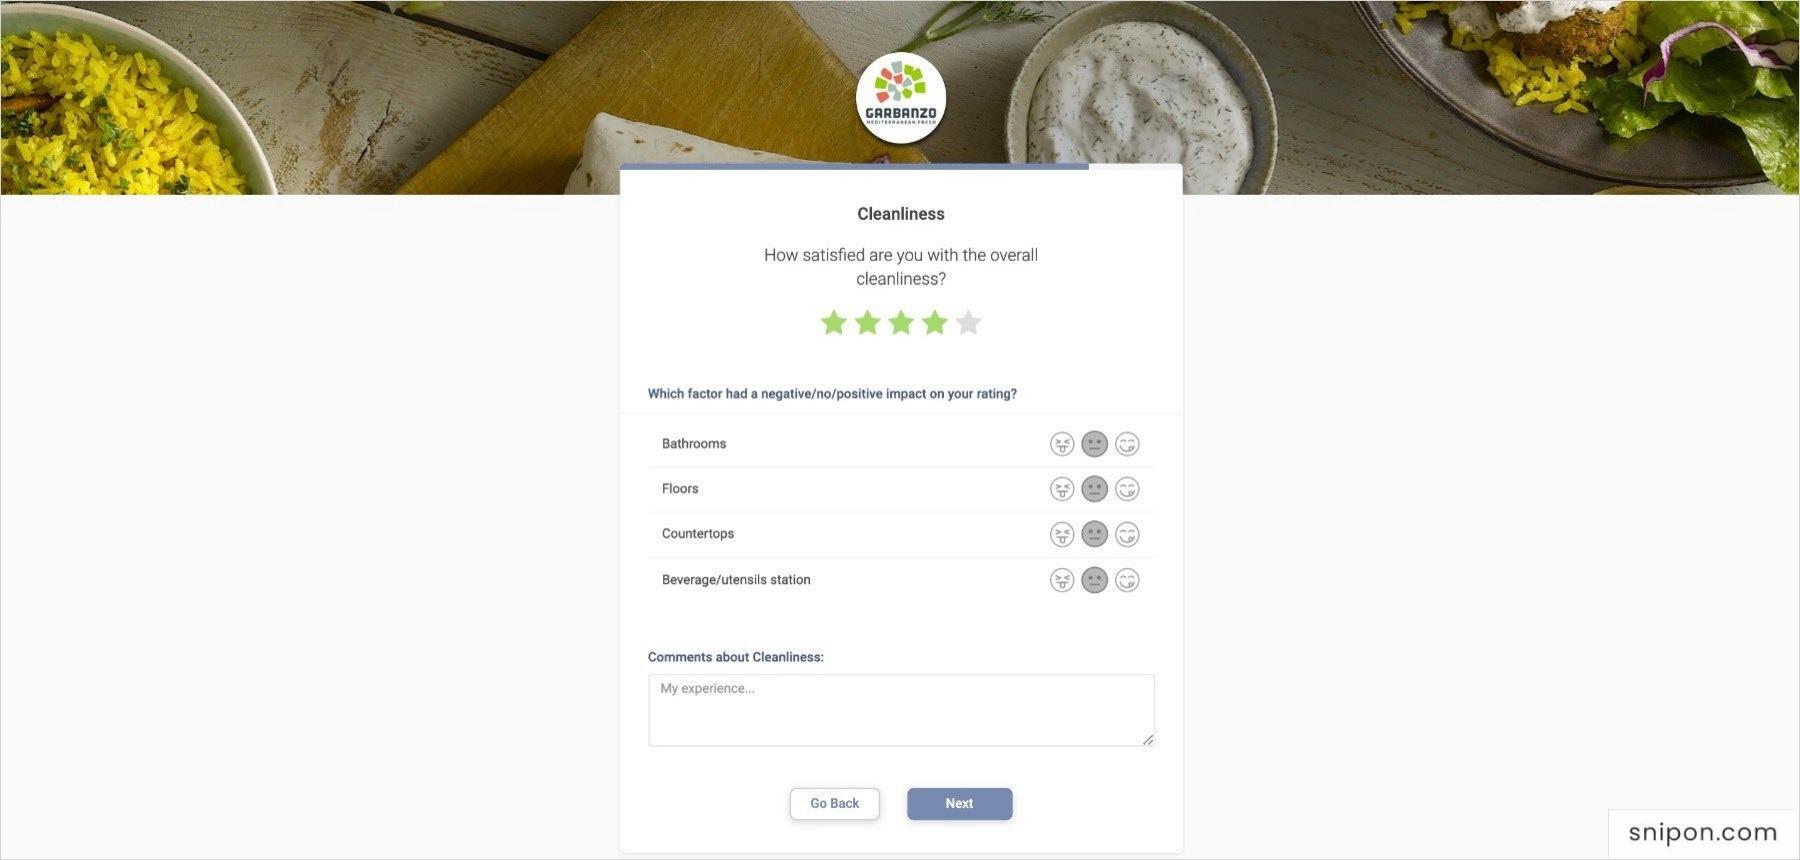 Rate Cleanliness & Sanitation - www.GarbanzoSurvey.com